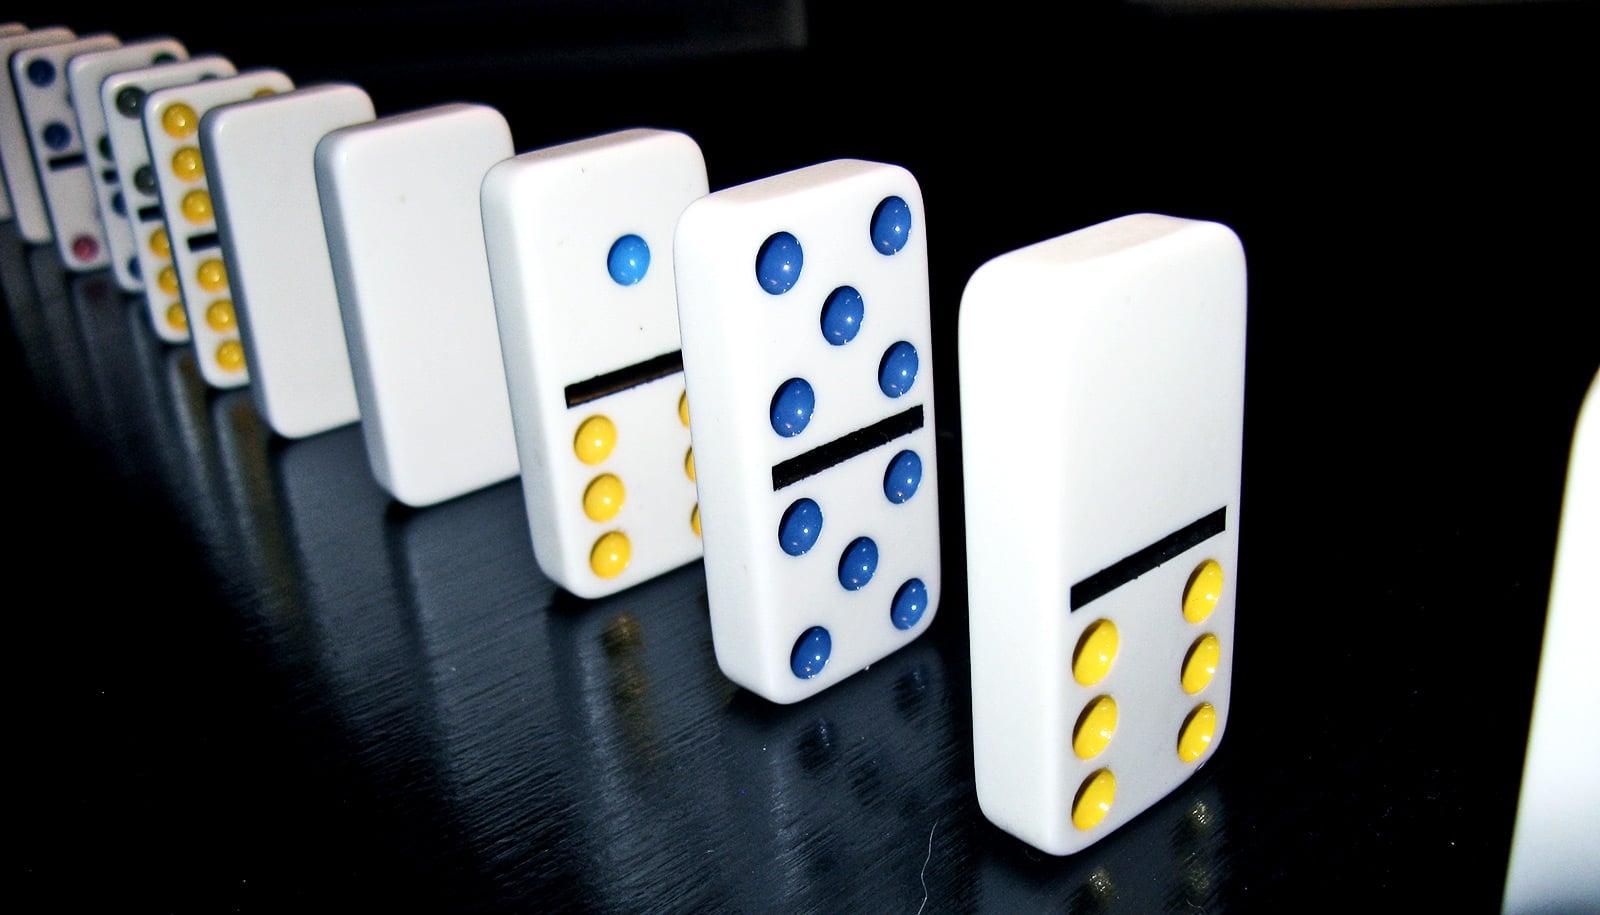 Huntington's 'first domino' may fall before birth